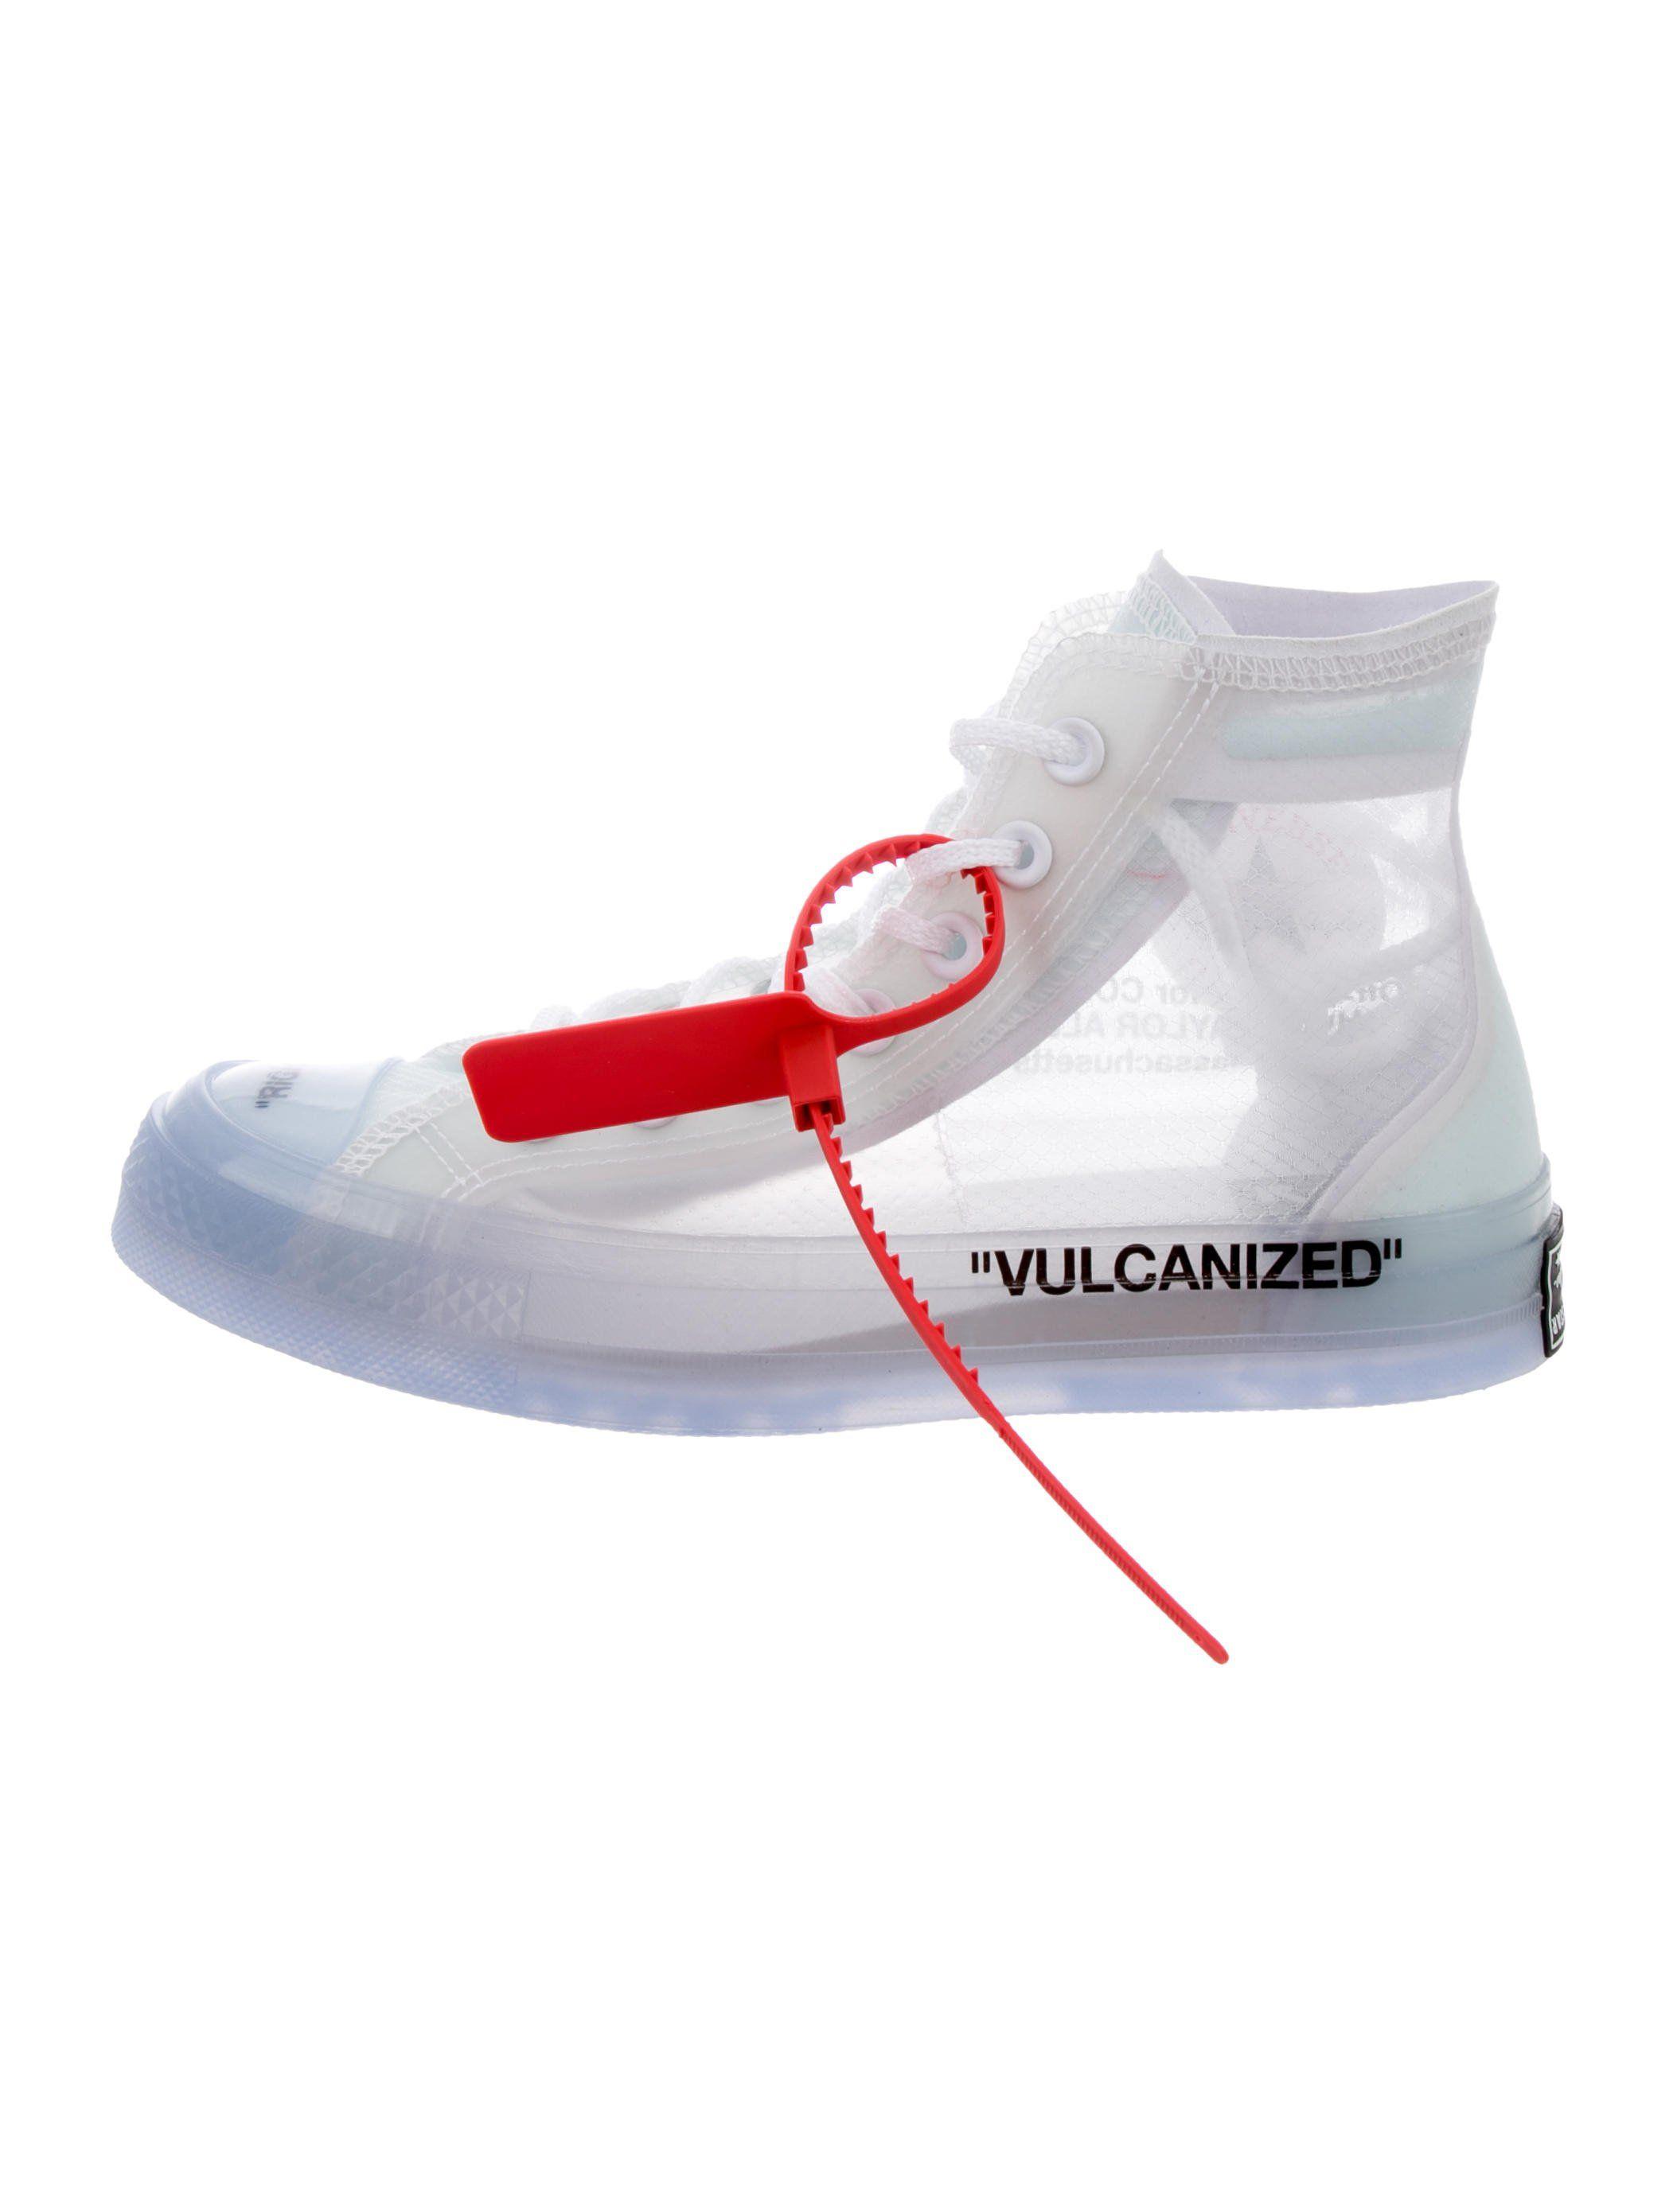 Nike Converse Chuck Taylor